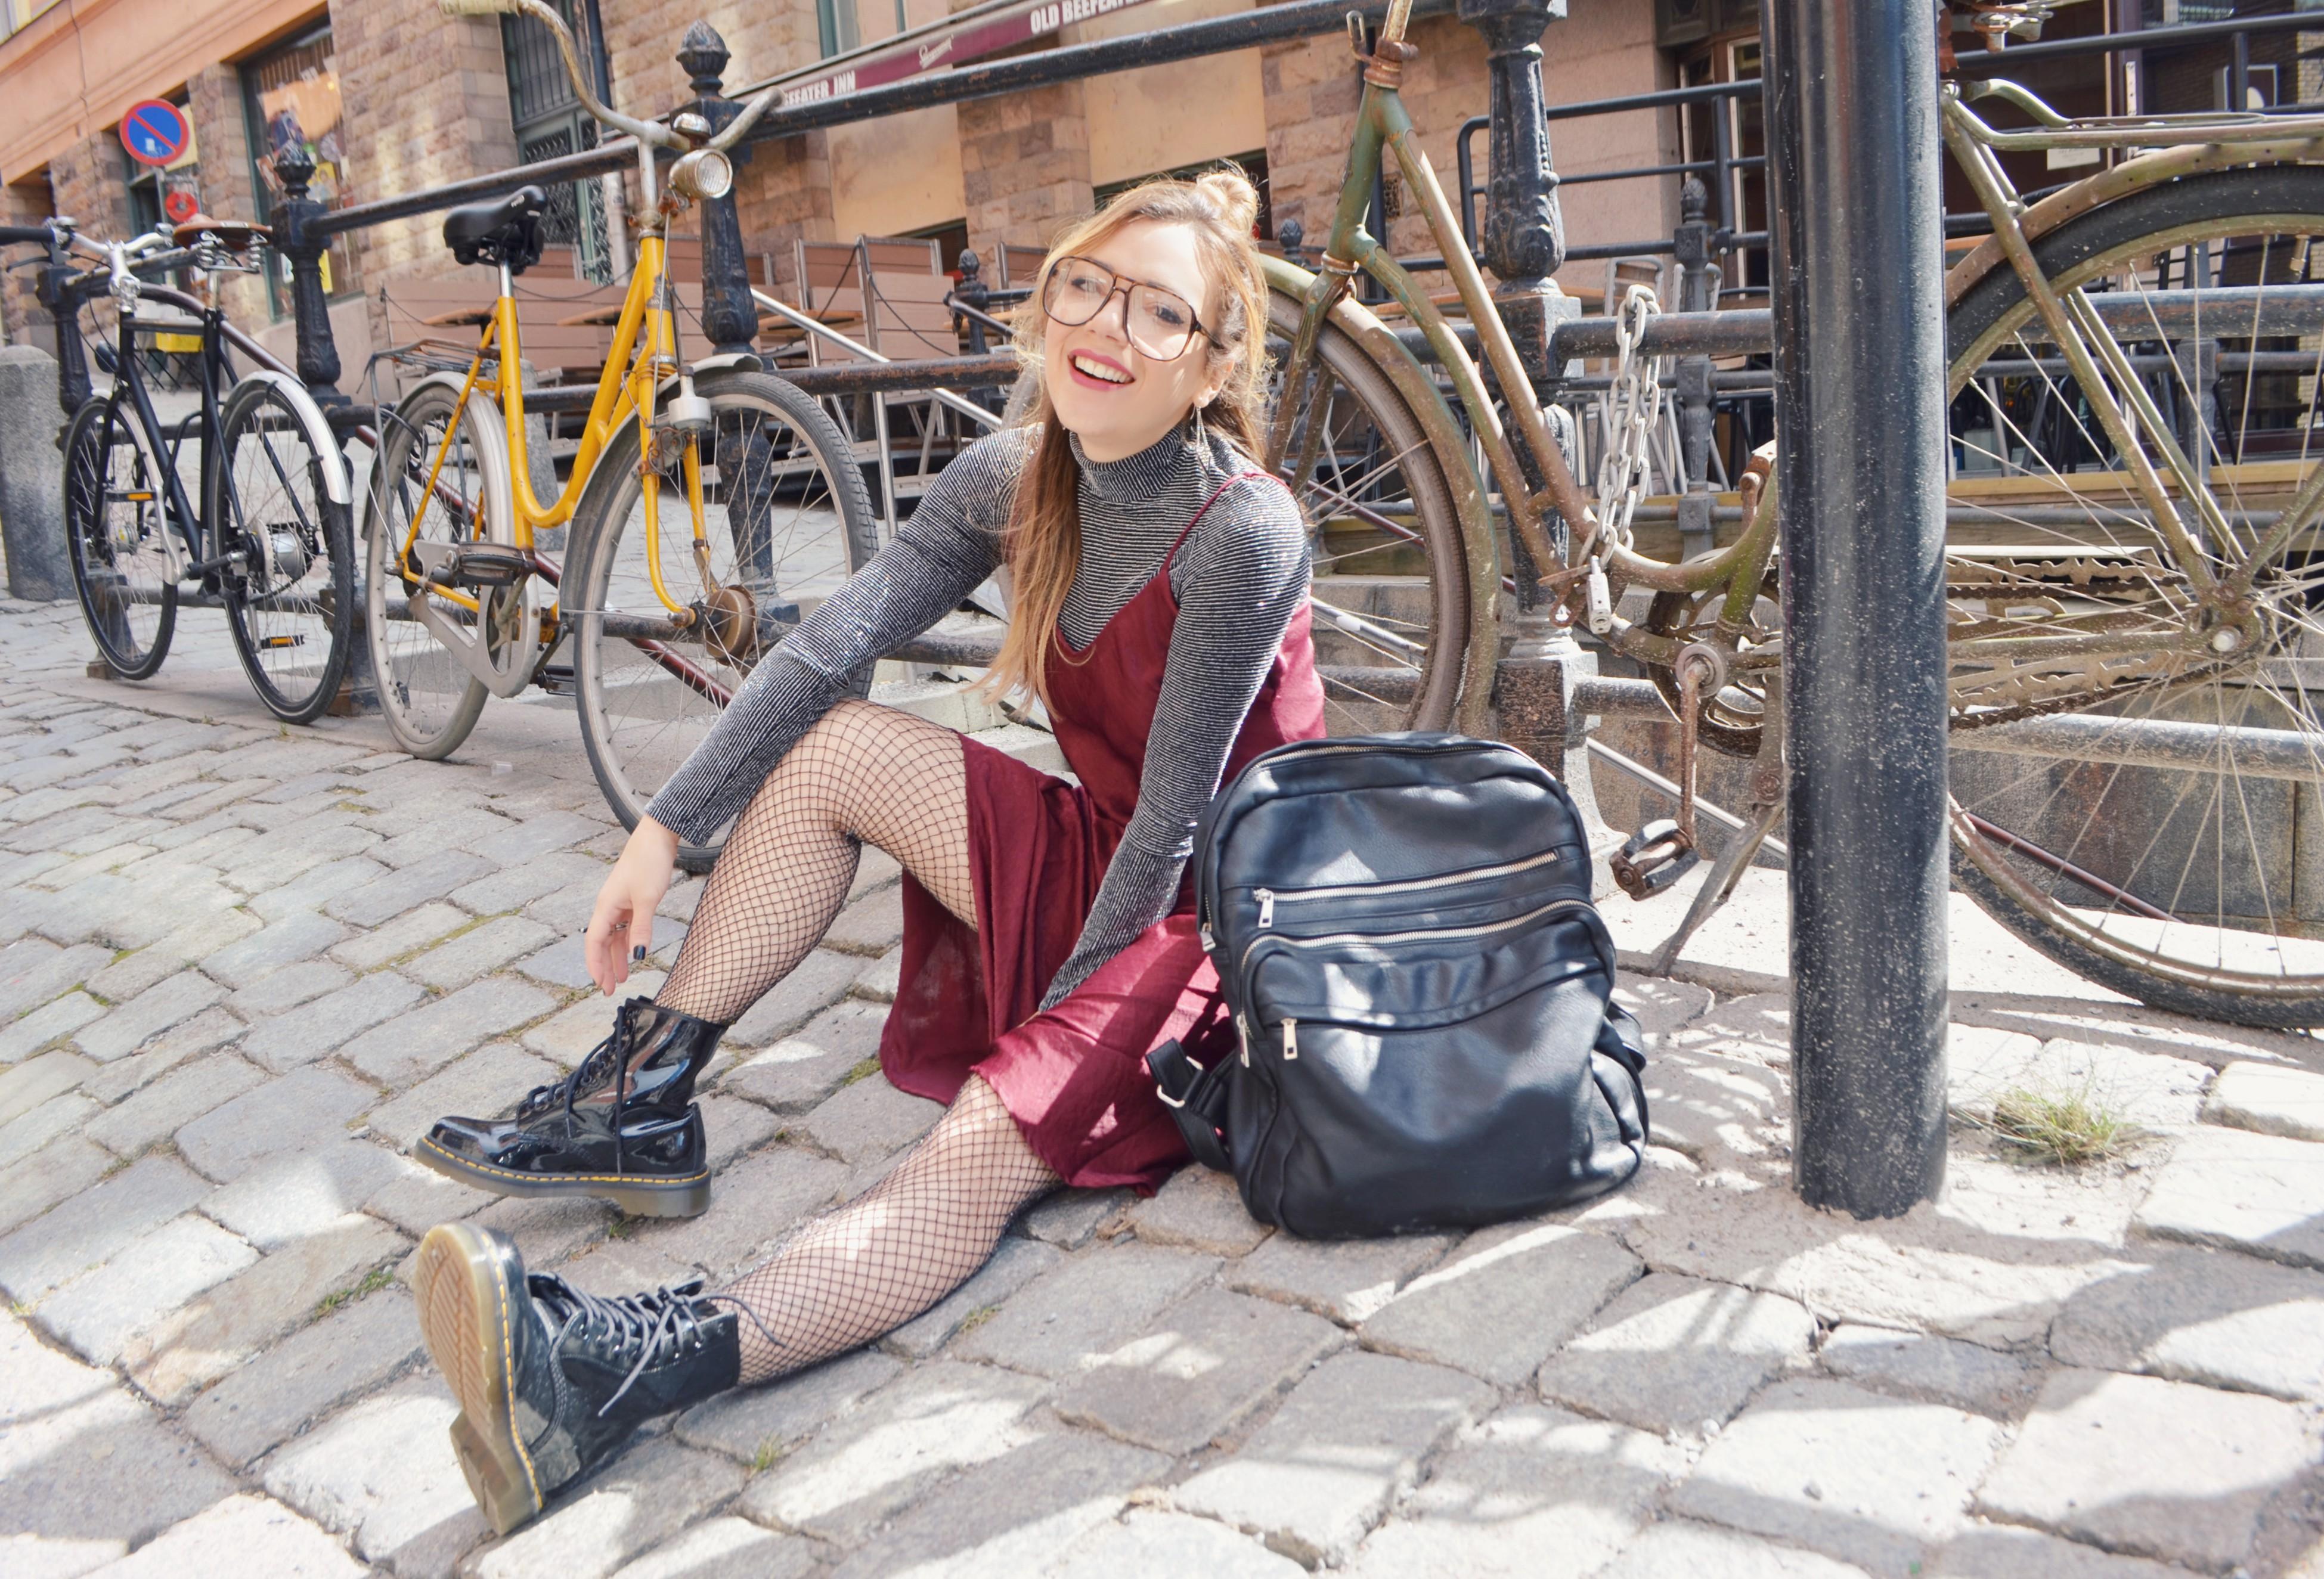 Blog-de-moda-ChicAdicta-fashionista-blog-de-viajes-fashion-travel-dr-martens-look-Chic-Adicta-justfab-dress-PiensaenChic-Piensa-en-Chic